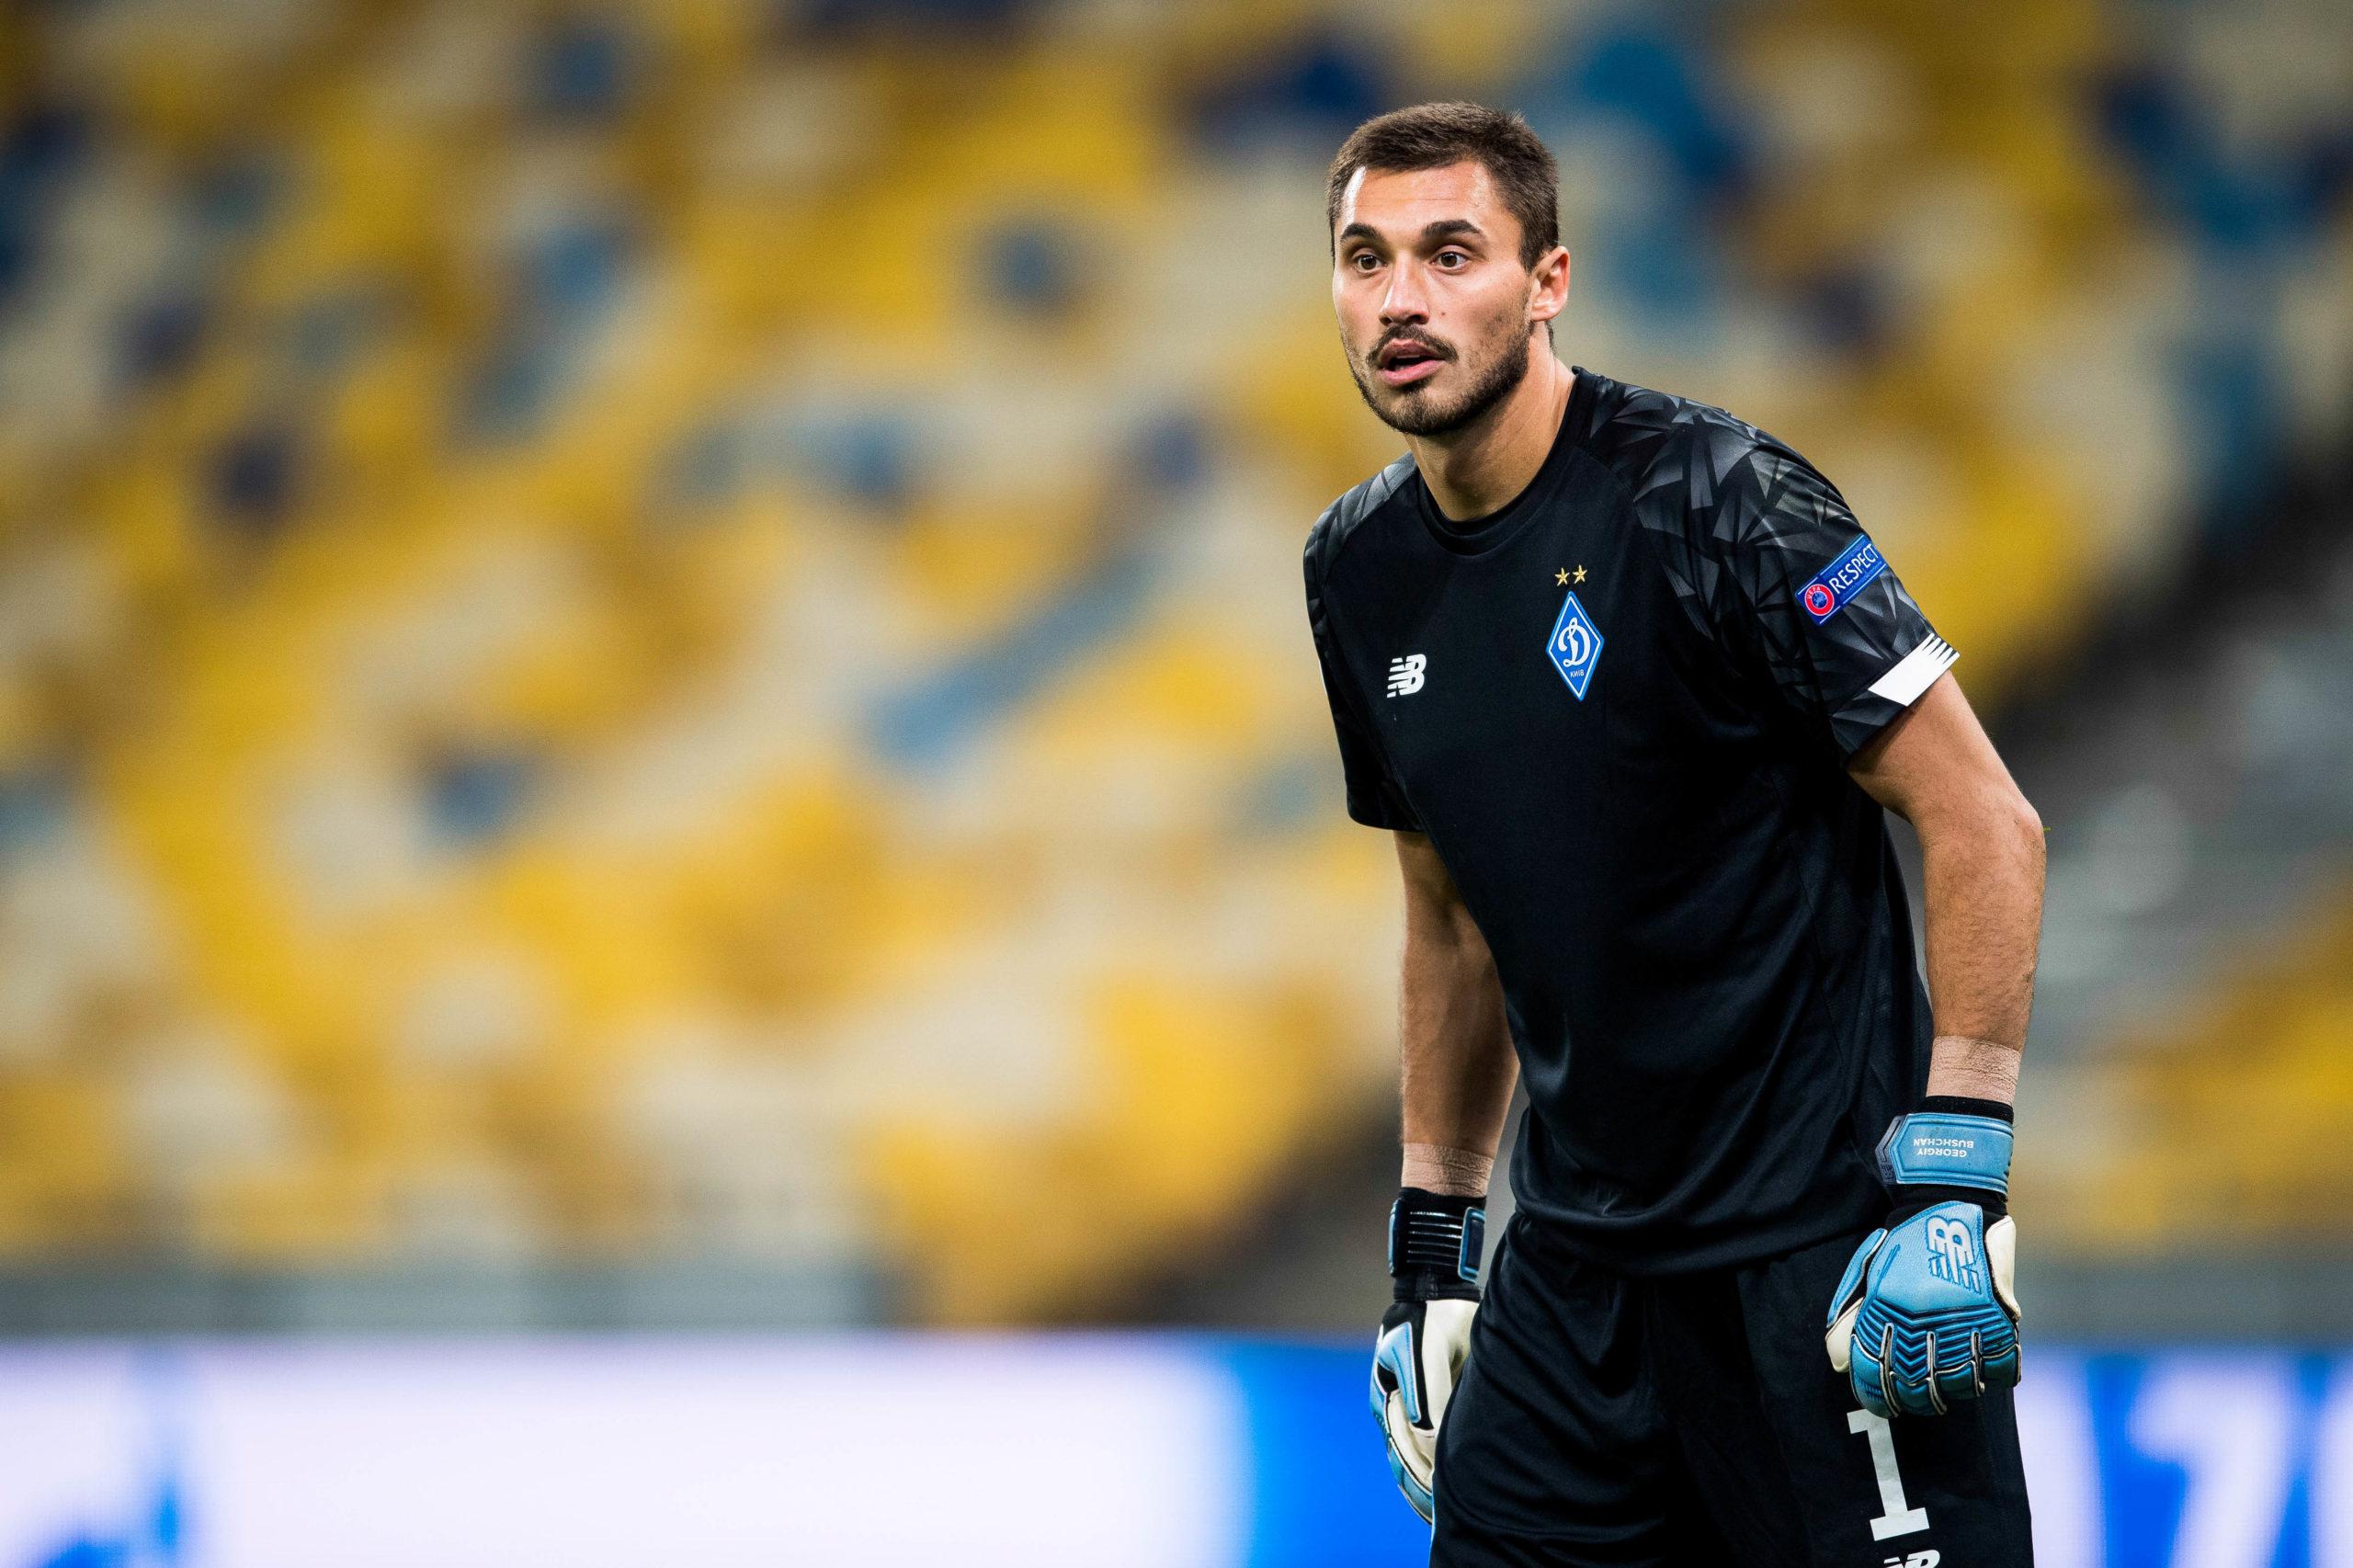 Mercato OM : Un ukrainien pour concurrencer Steve Mandanda ?